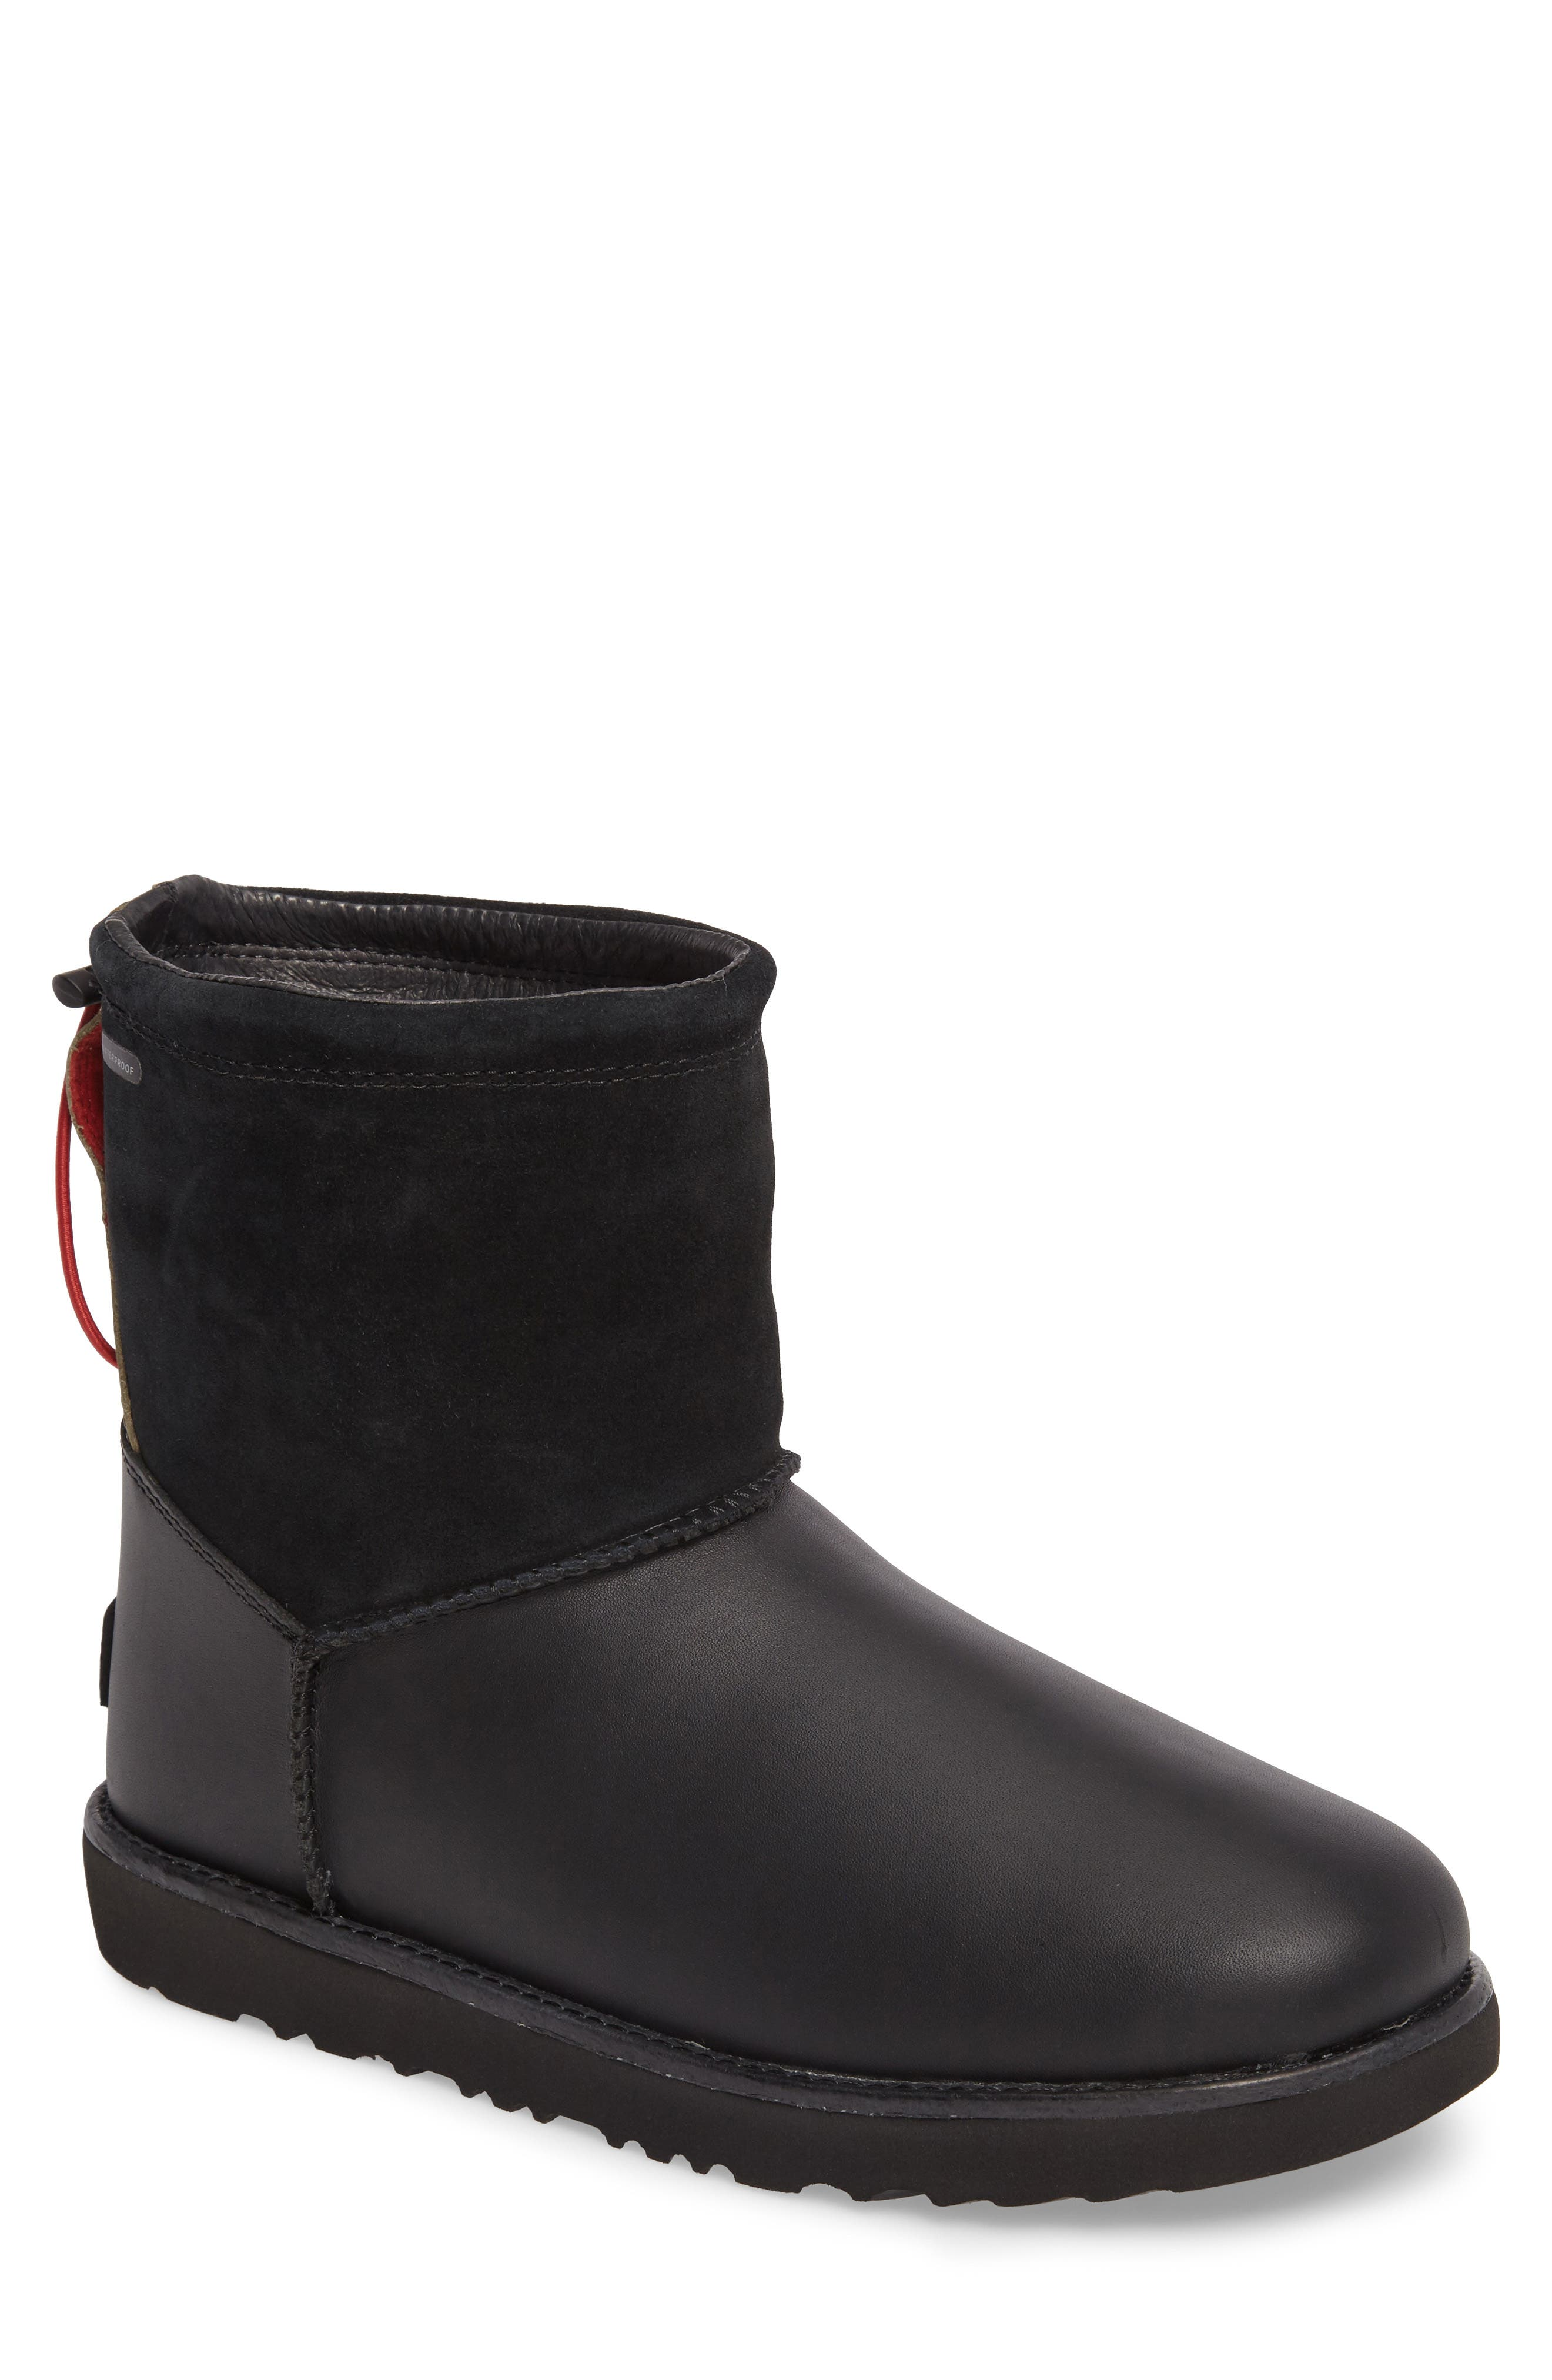 Classic Waterproof Boot,                             Main thumbnail 1, color,                             Black